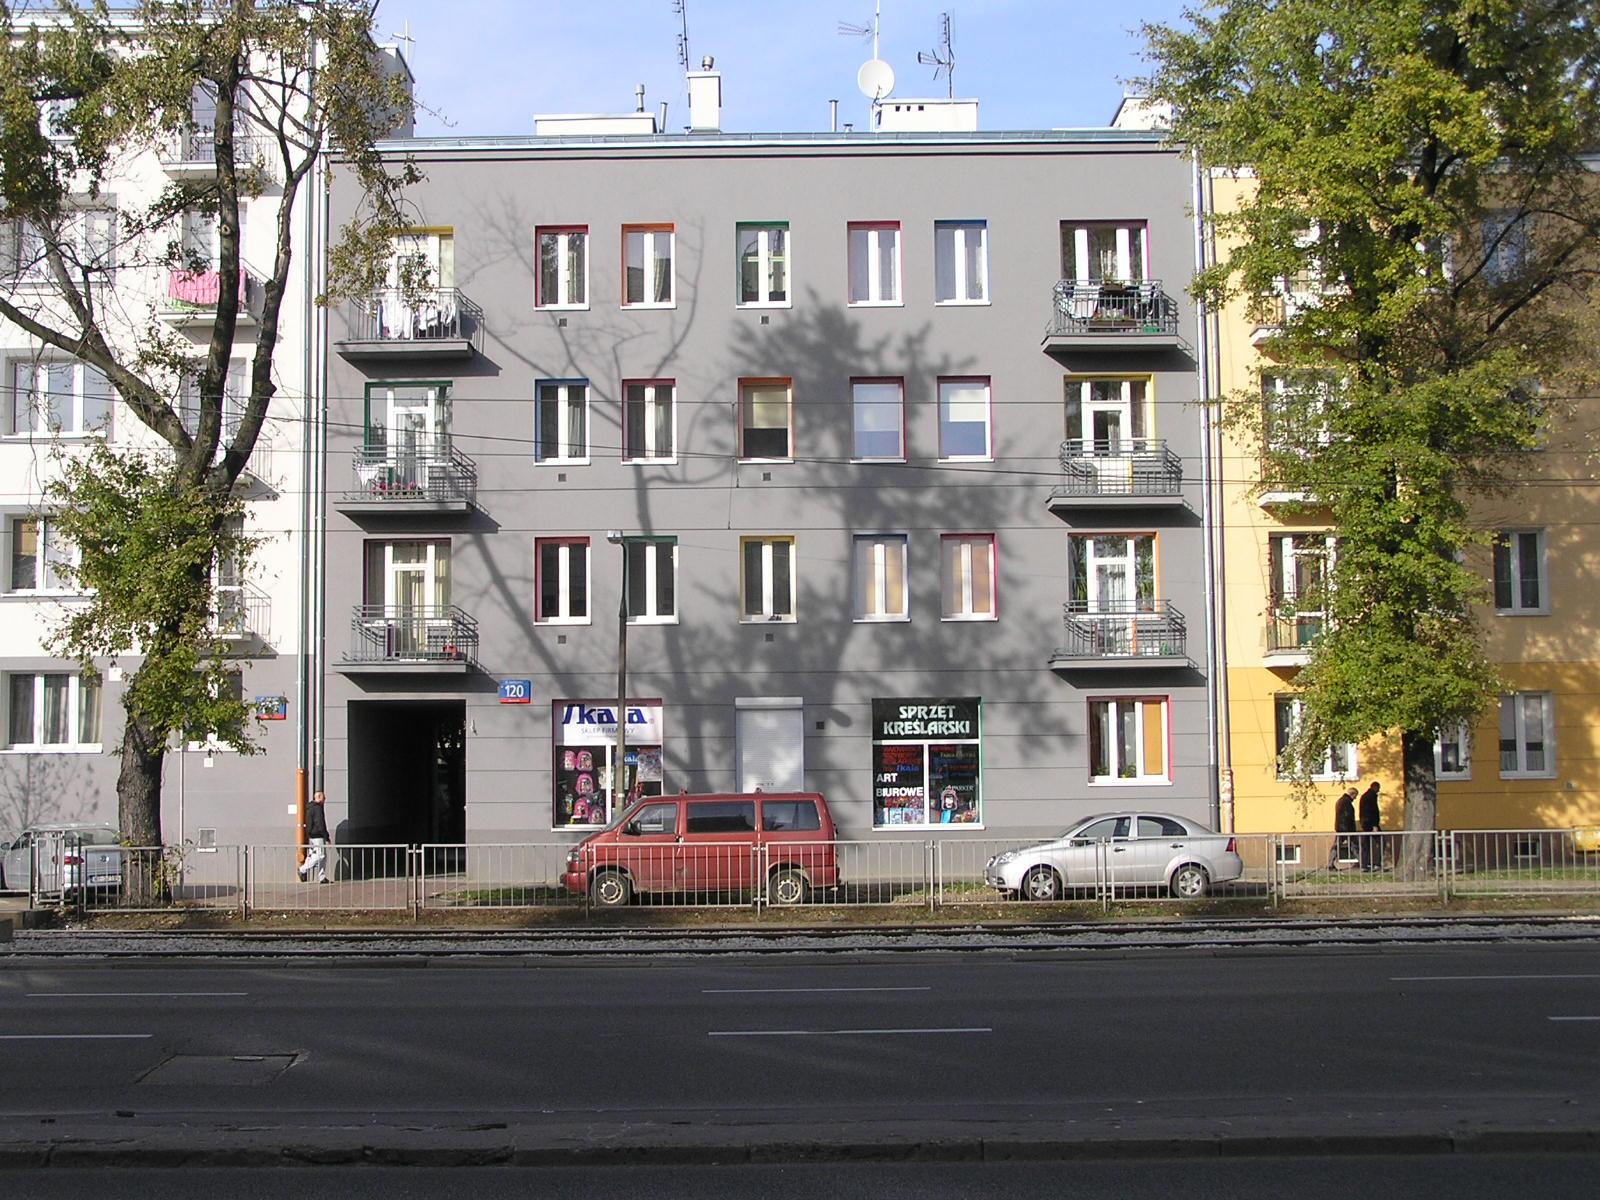 Grochowska 120